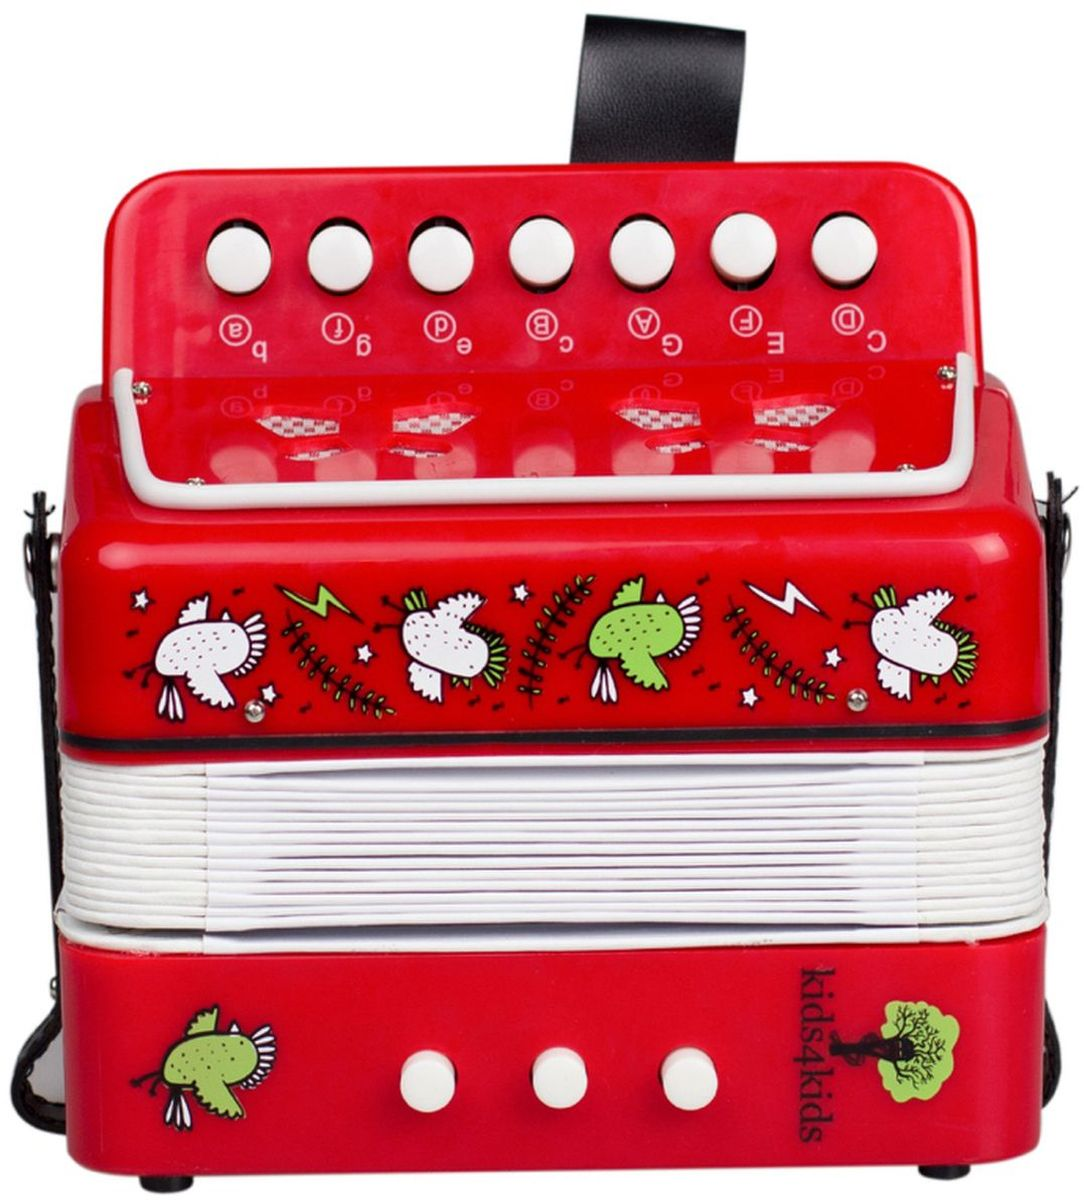 Kids4Kids Музыкальная игрушка Аккордеон Волшебные ноты - Музыкальные инструменты